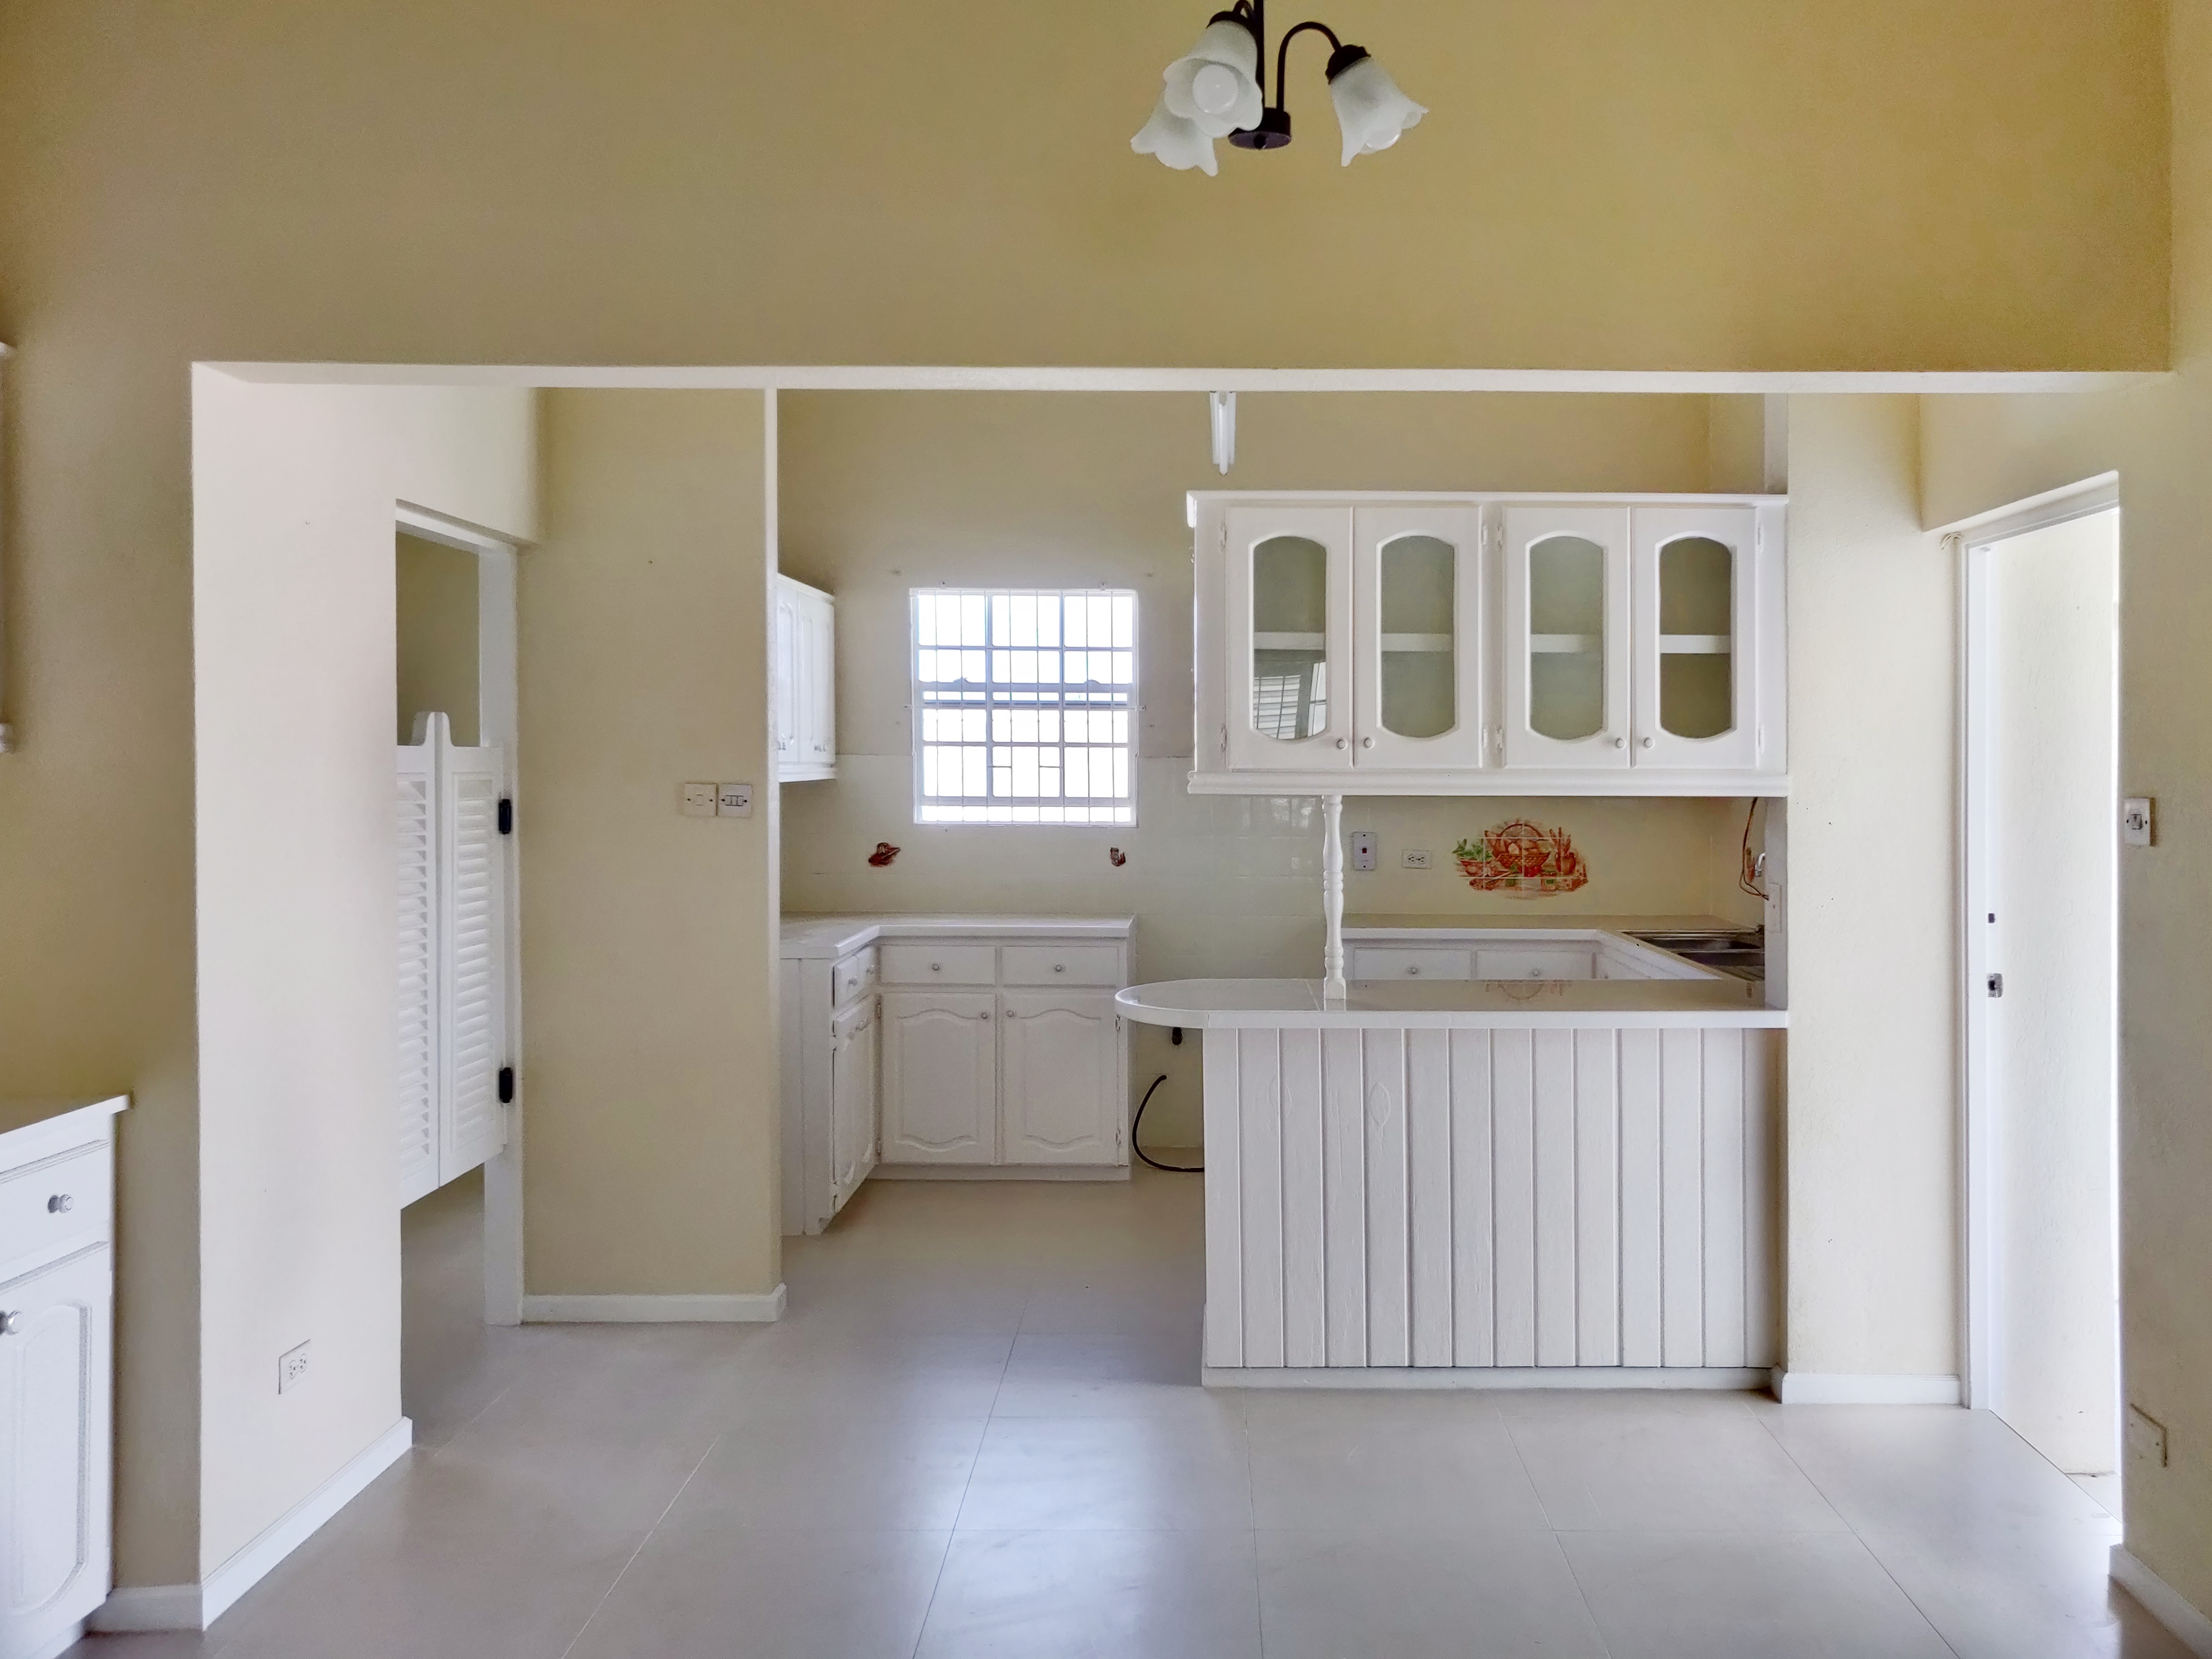 Dining Room, Wanstead, St. Michael